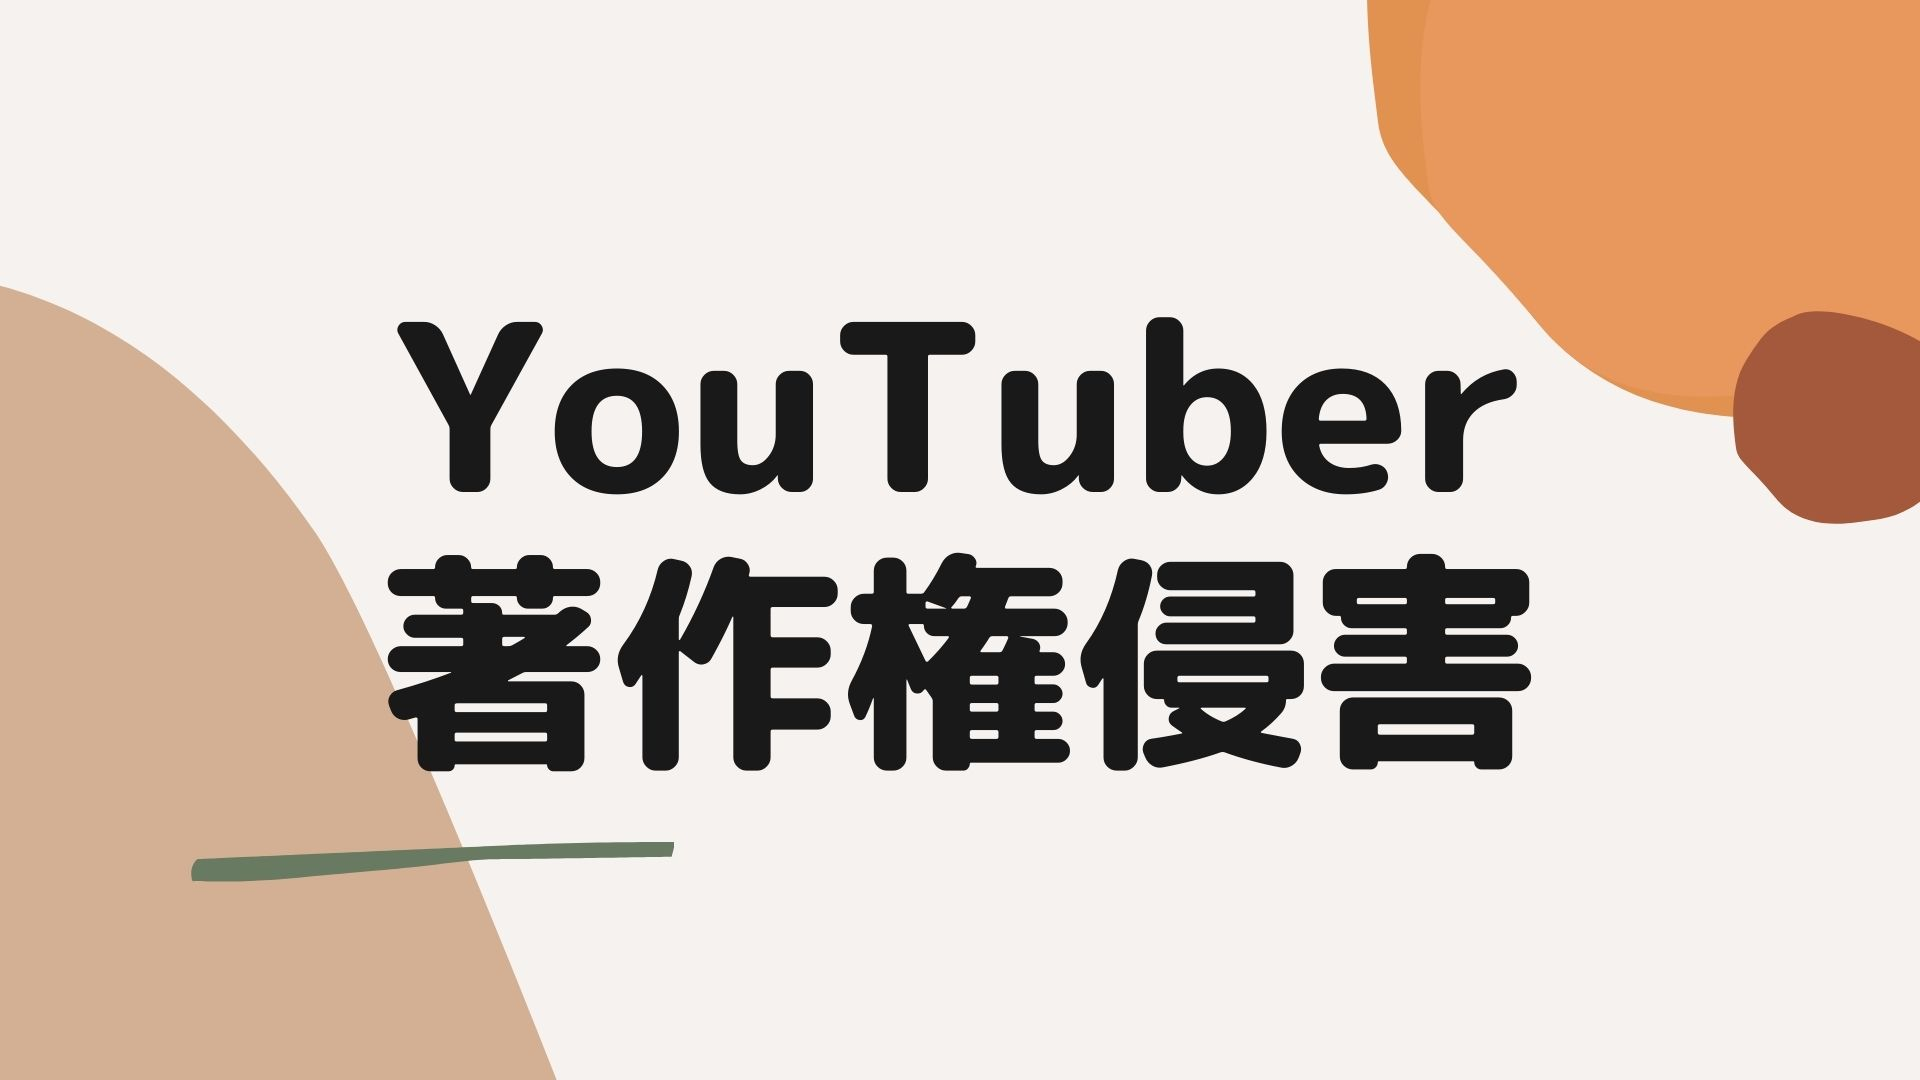 YouTuberは全員著作権侵害をしている